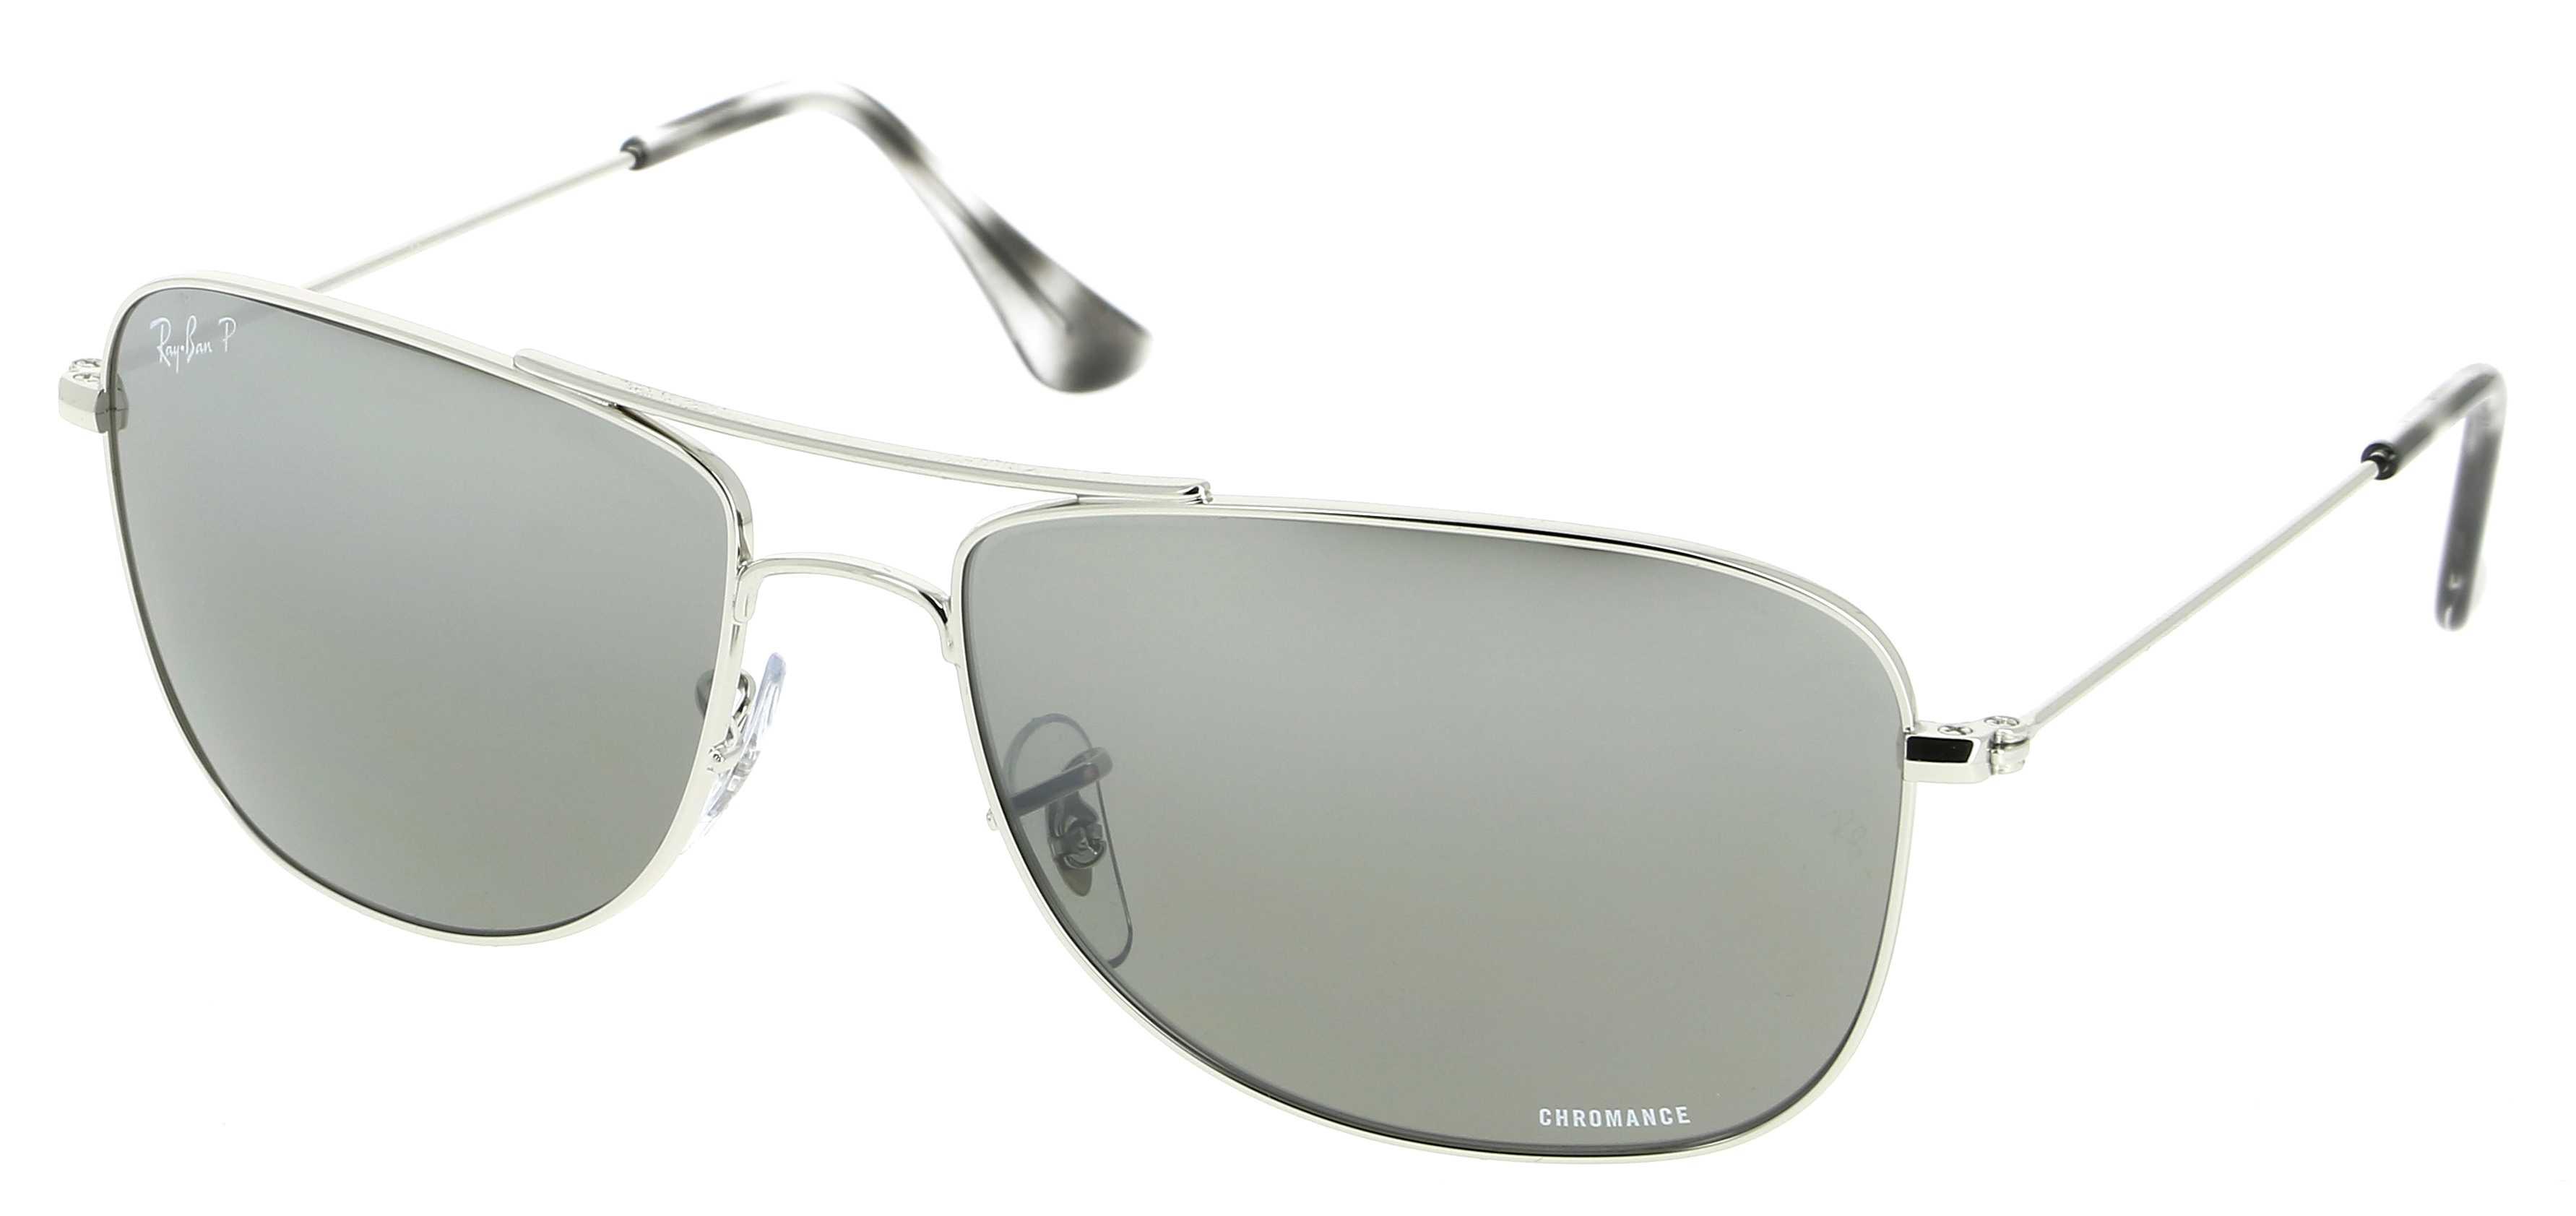 a3dafb1e0f2 Ray Ban Chromance Polarized Sunglasses Silver Grey Mirror ...